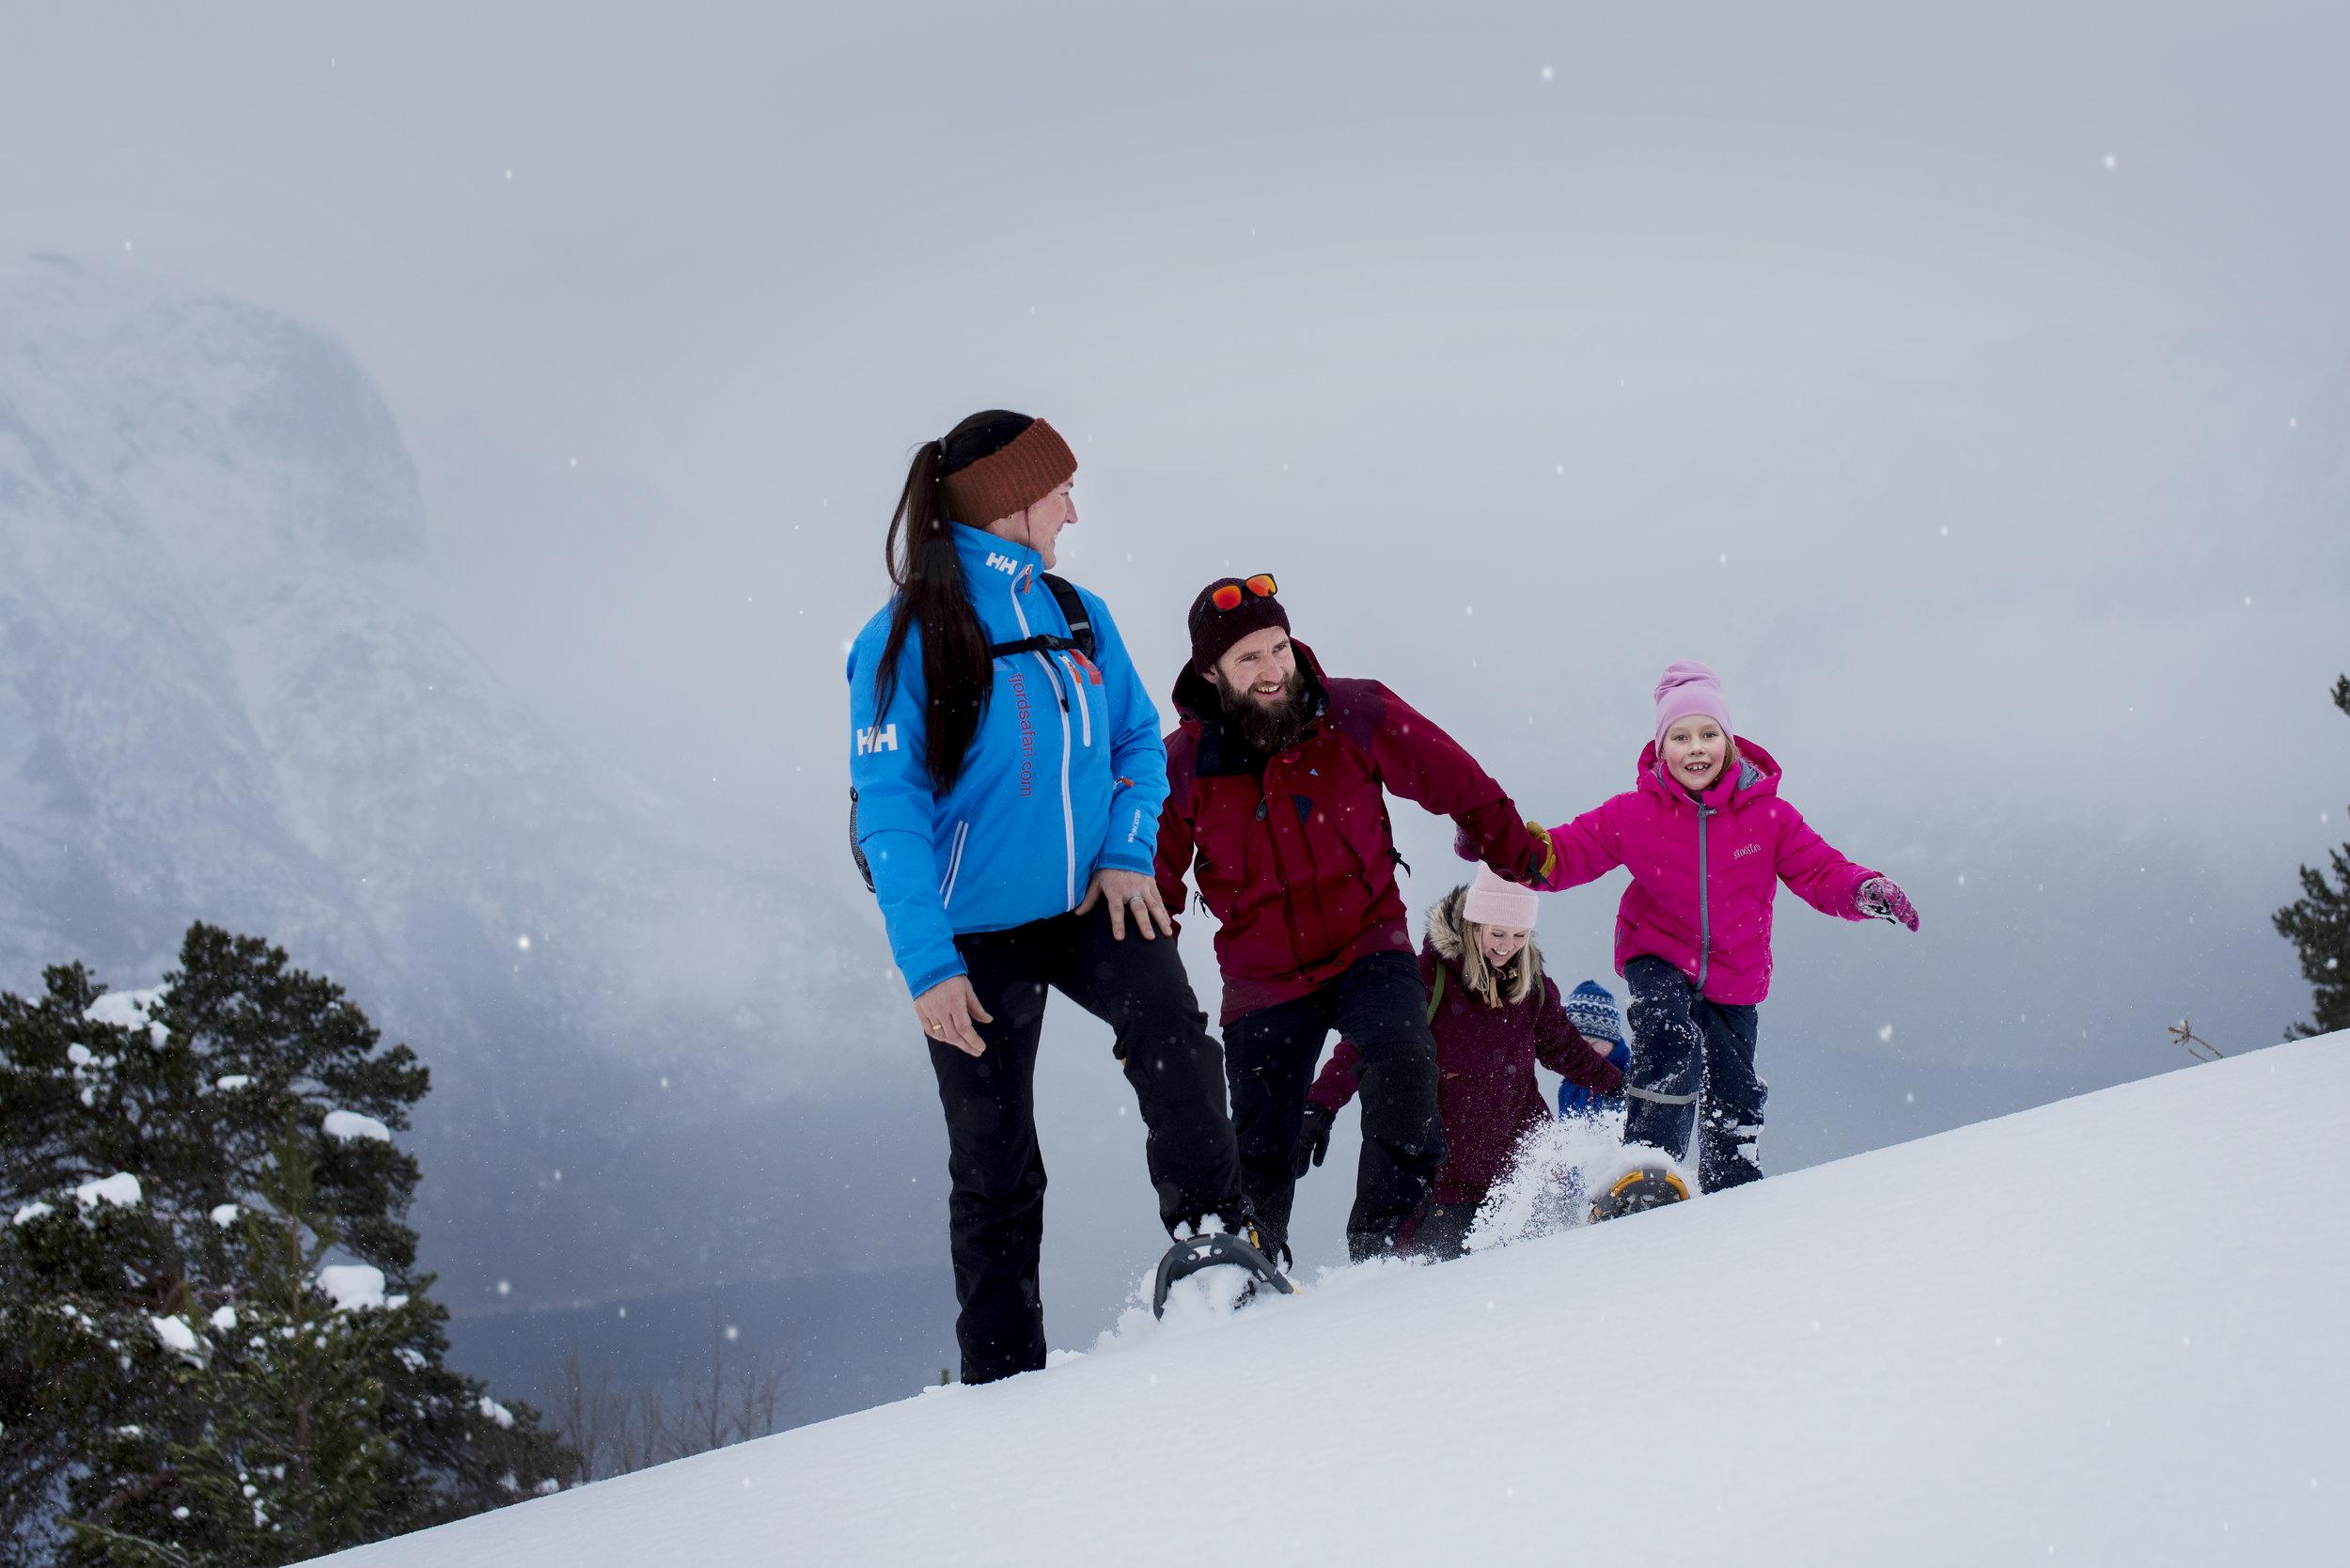 practical information - Period/time: 26.12.2018 - 31.03.201926.12.2019 - 31.03.2020: 08:15 - ca. 11:00 (meet at 08:00)1.02.2020 - 31.03.2020: 15:30 - ca. 18:00 (meet at 15:15)Dinner: between 18:00 - 20:00 in Ægir BrewPubPrice: NOK 1245 pp. incl. snowshoe hike and Ægir Viking Plank